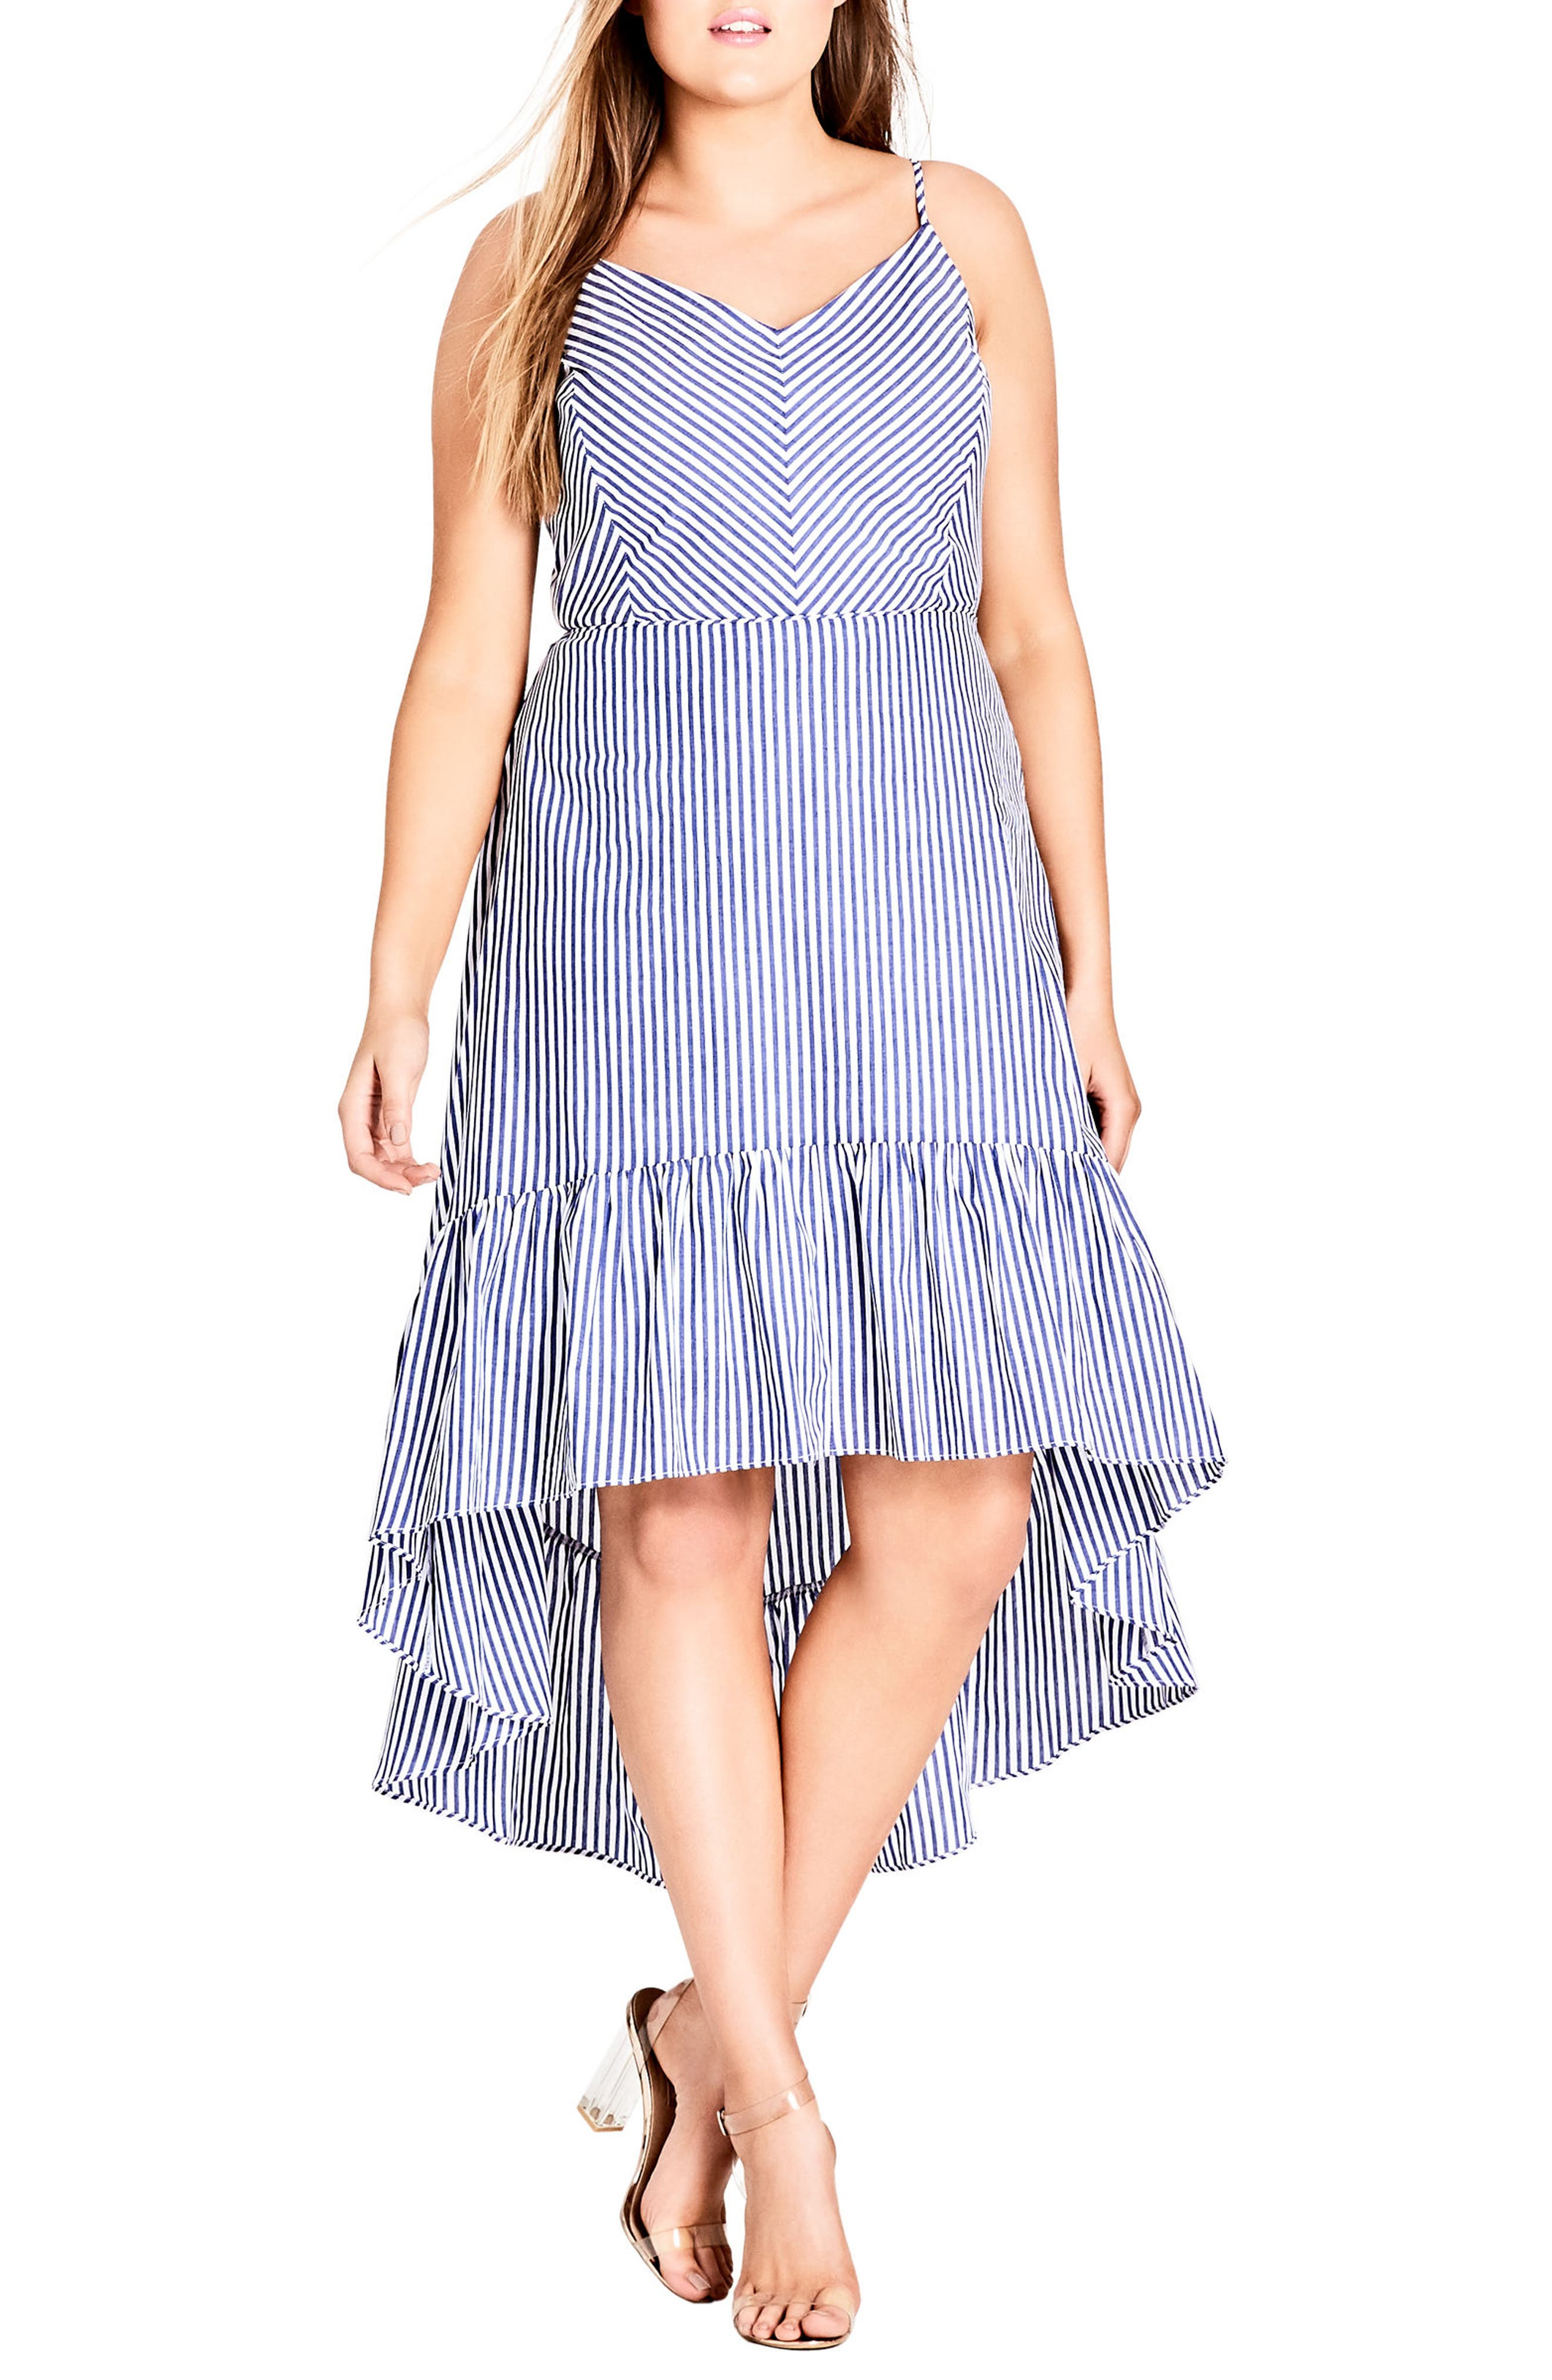 Mallorca Stripe Maxi Dress,                             Main thumbnail 1, color,                             Blue Stripe